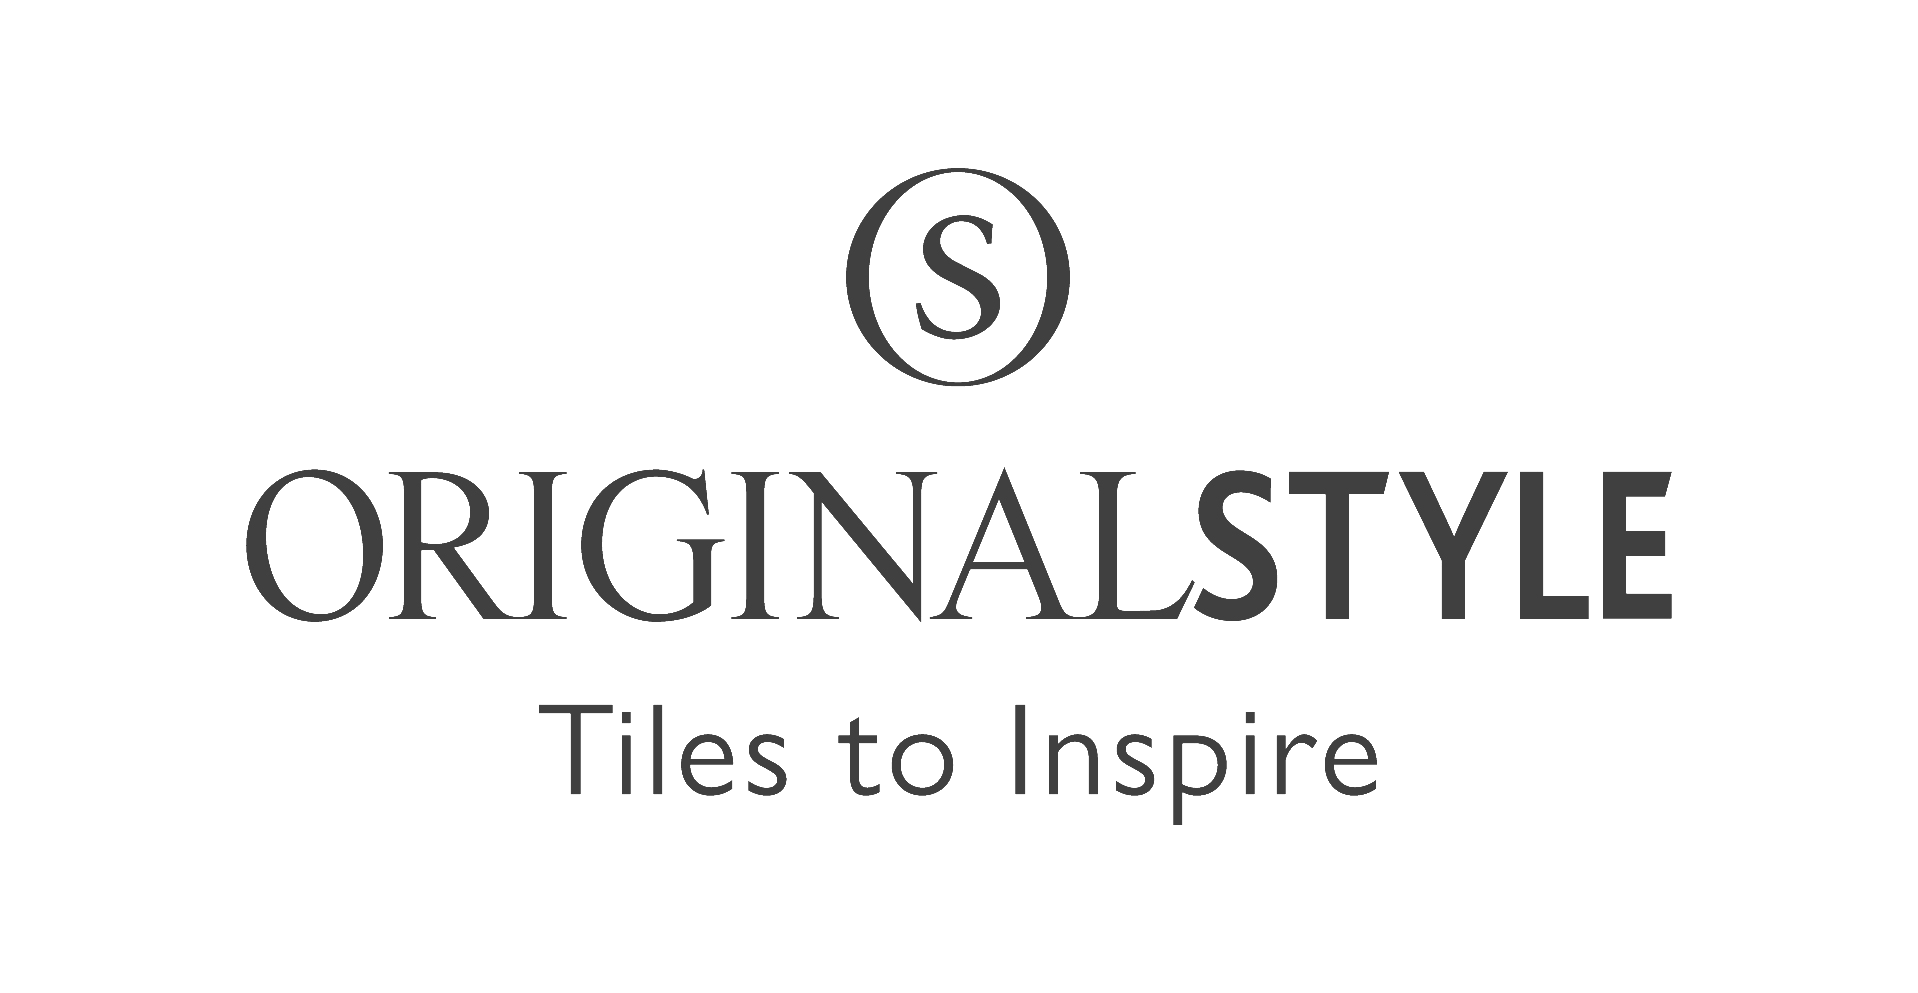 Original Style Inspire Grey on Transparent 3 Professional translations